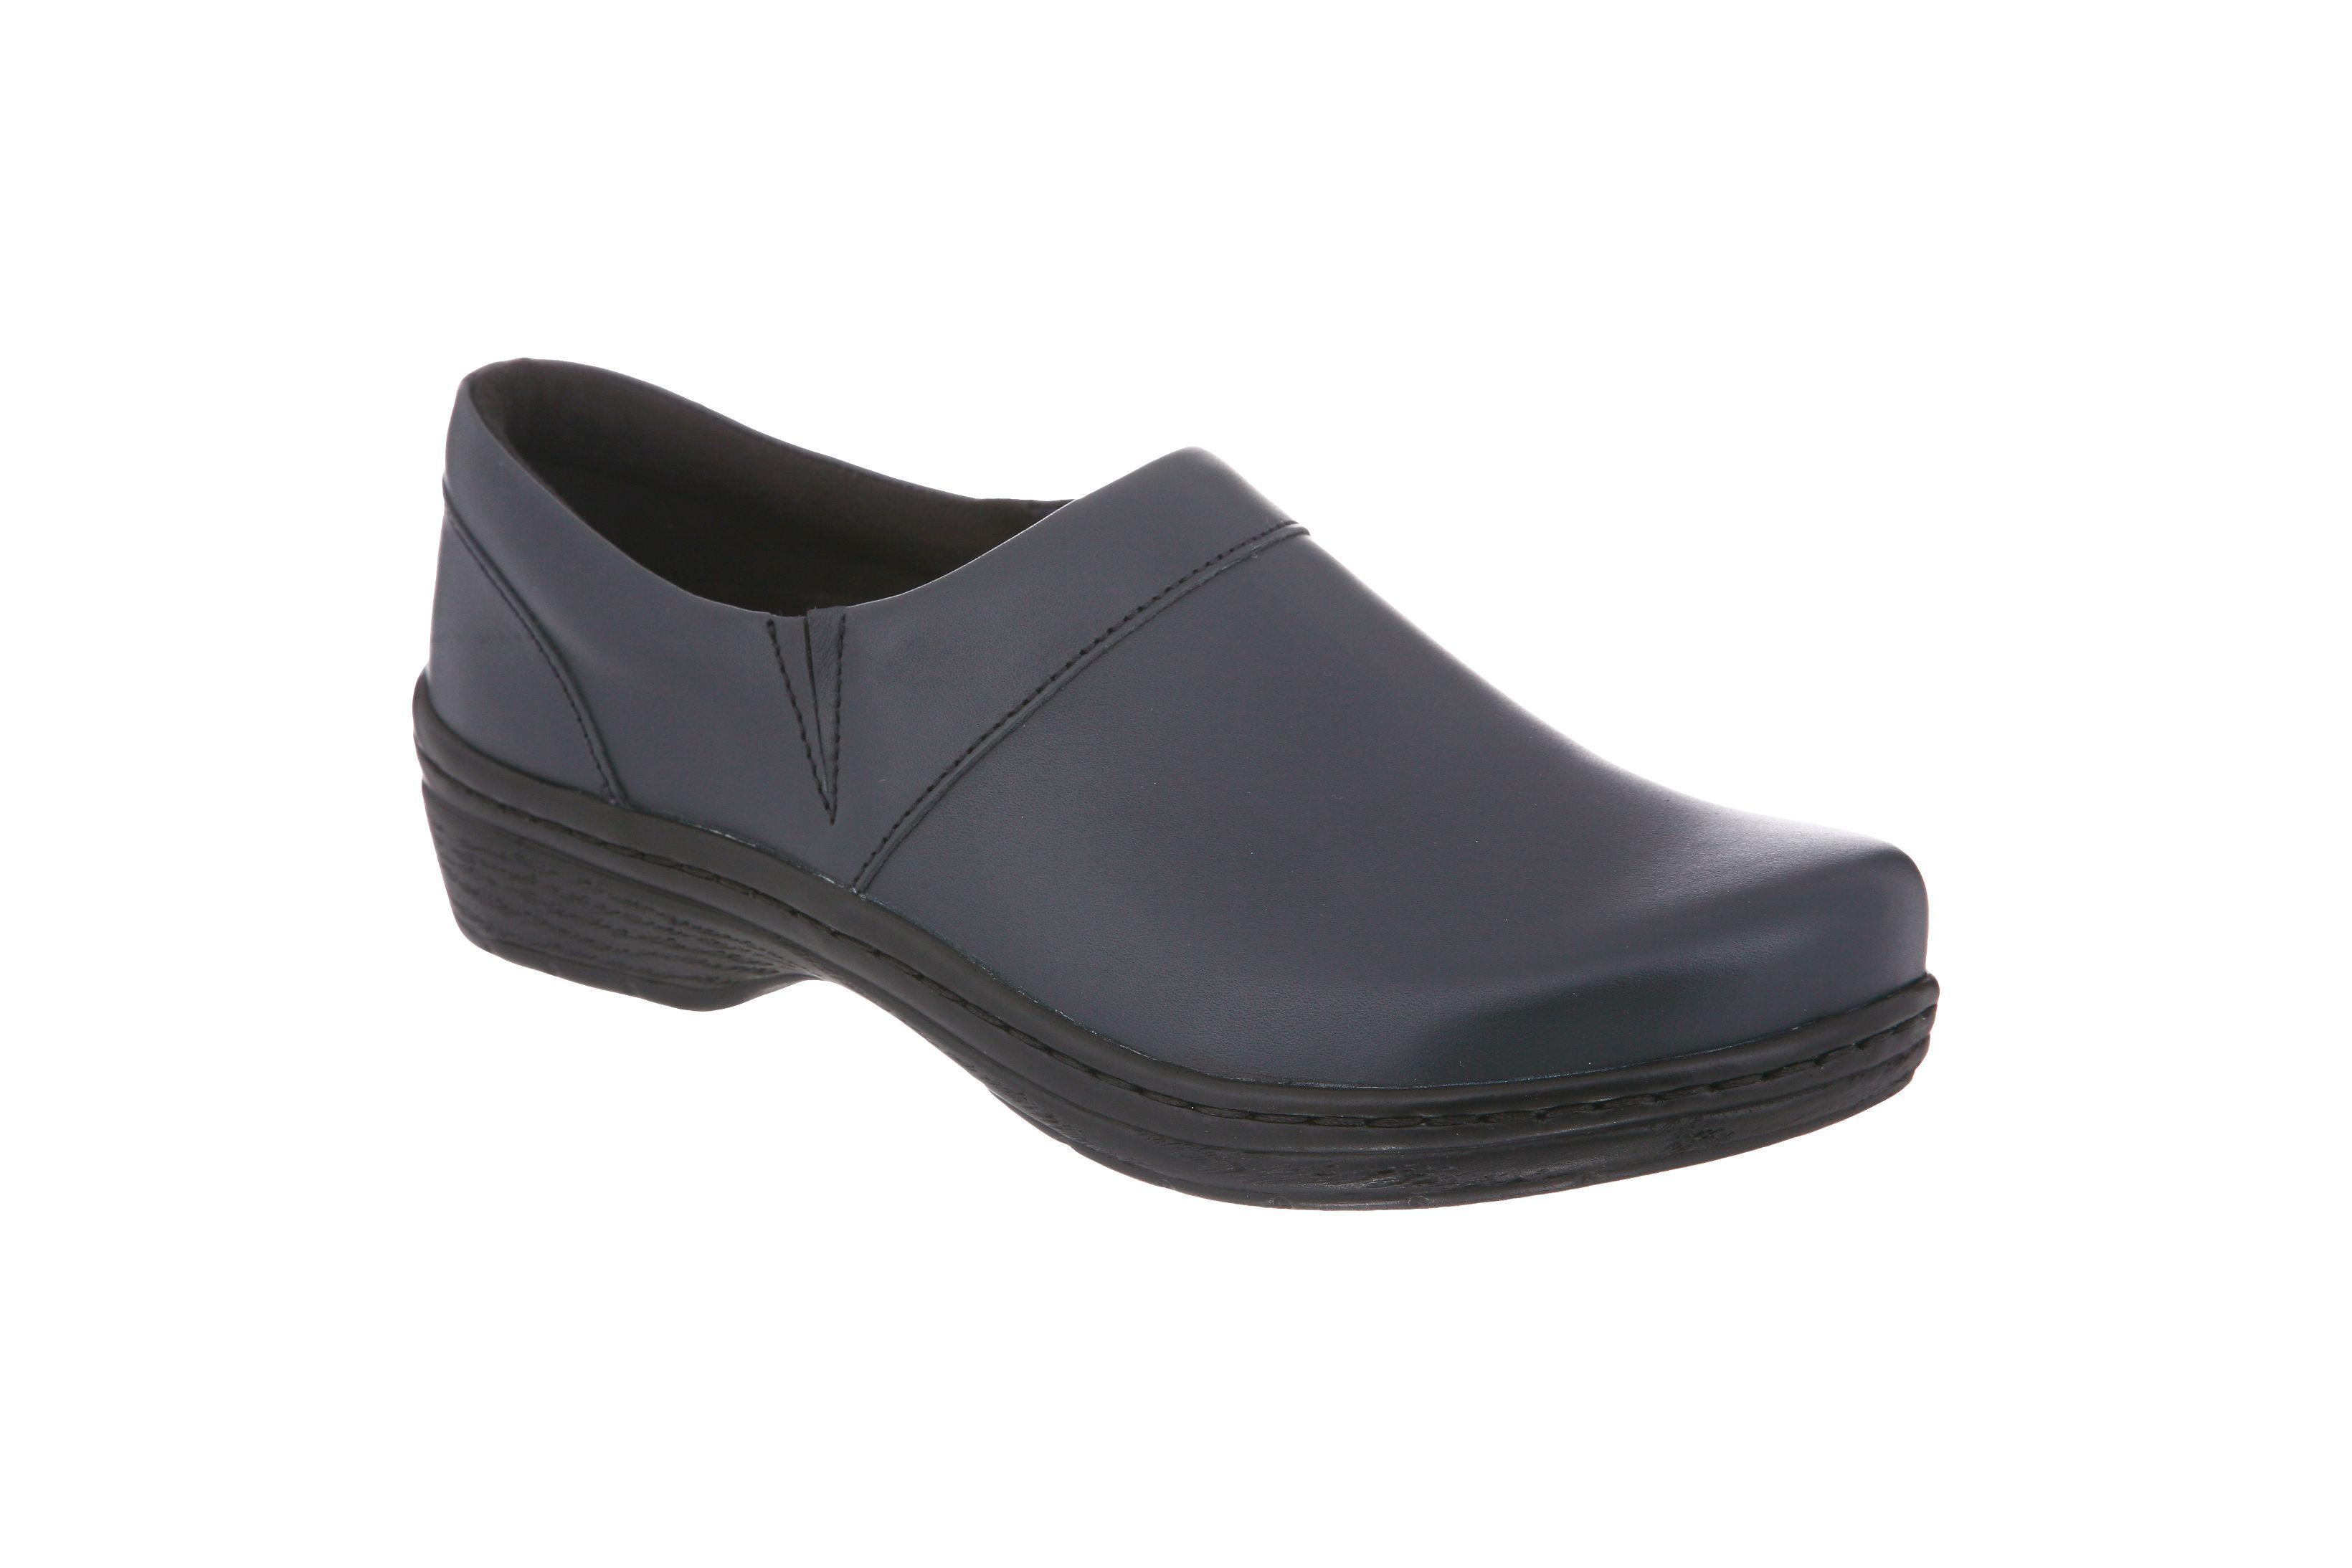 fbf0fe530e8b1 Professional Work Shoes - Keep Shopping Online